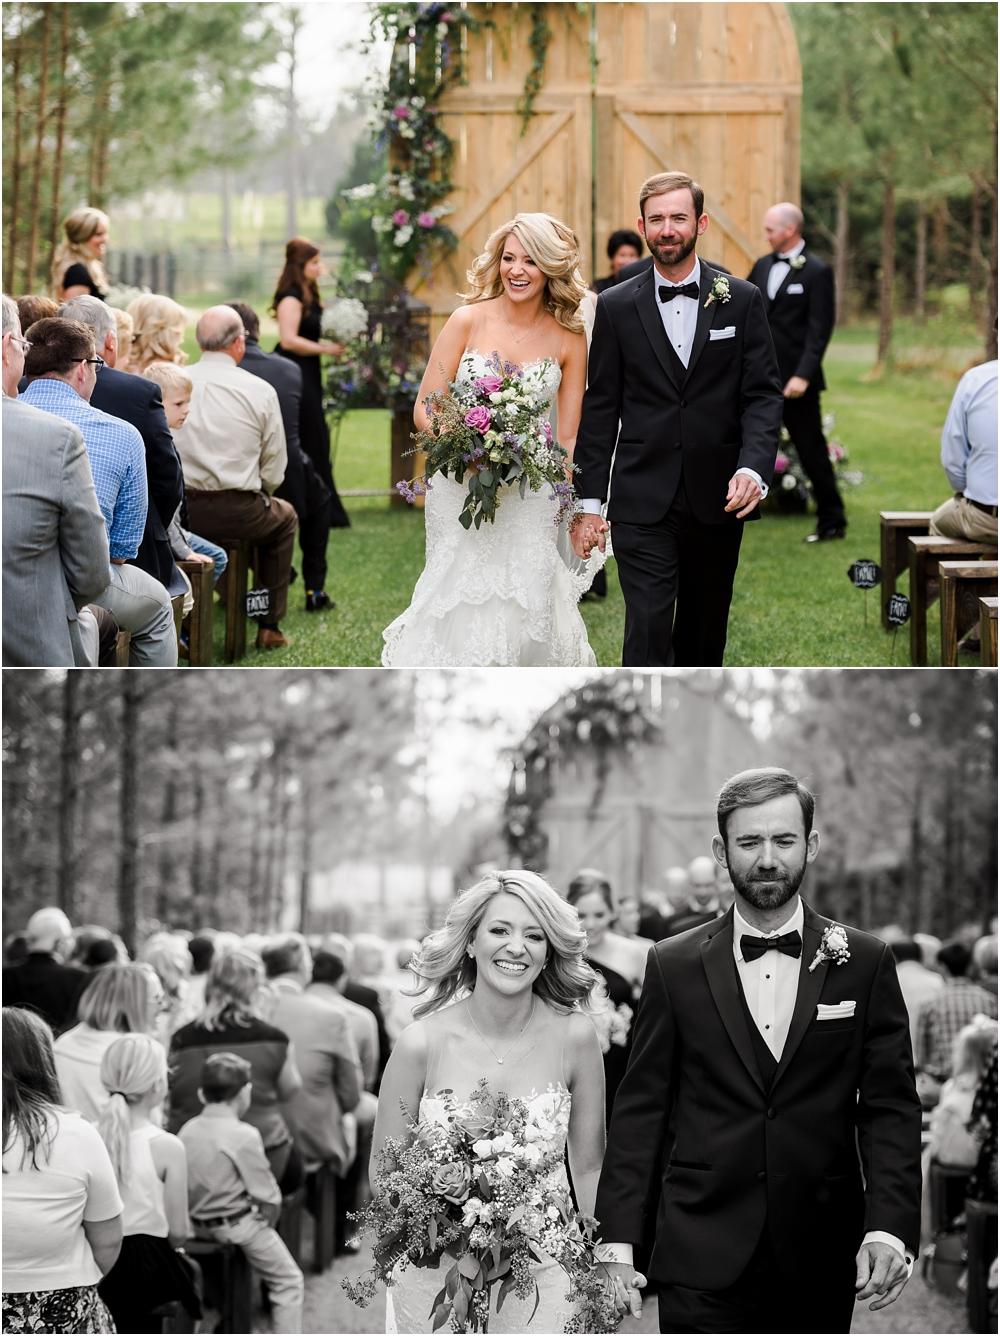 buchanan-florida-wedding-photographer-kiersten-grant (338 of 800).jpg